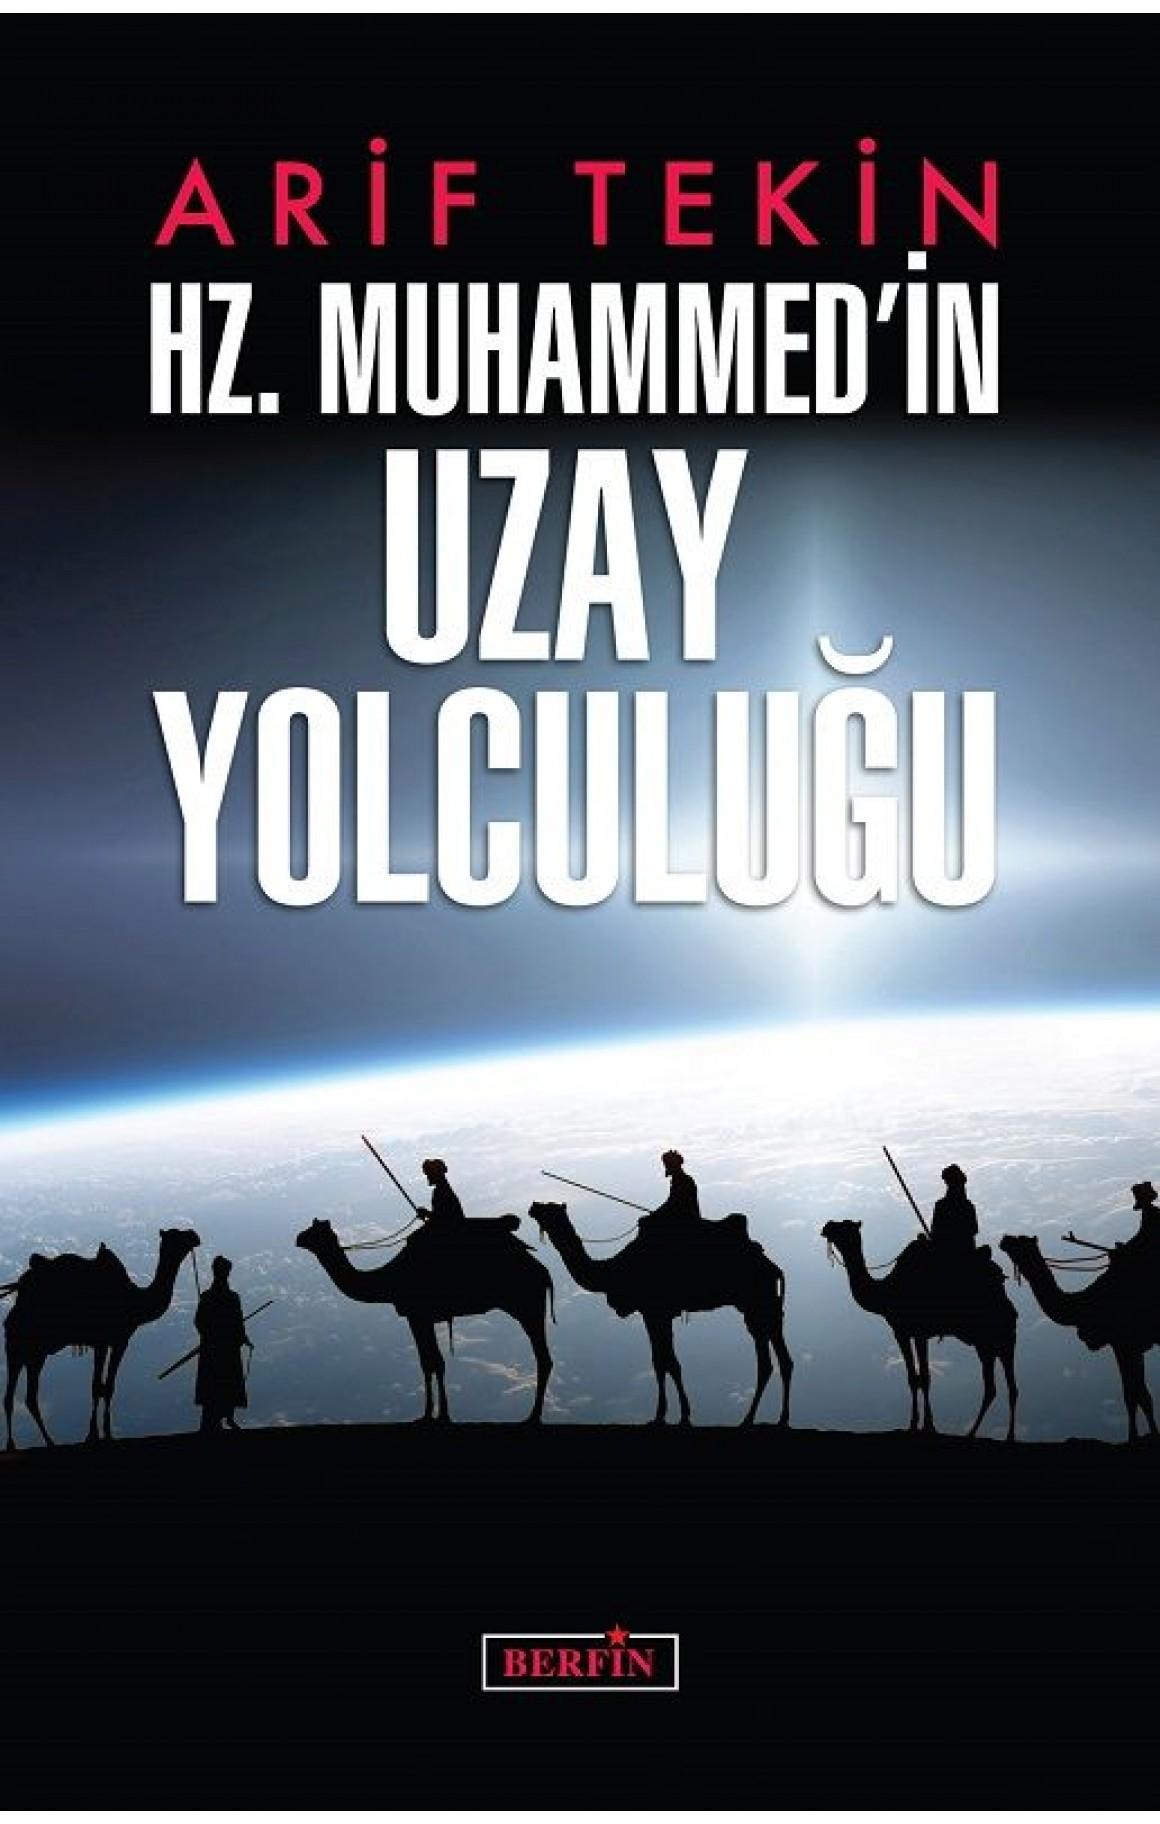 Hz. Muhammedin Uzay Yolculuğu